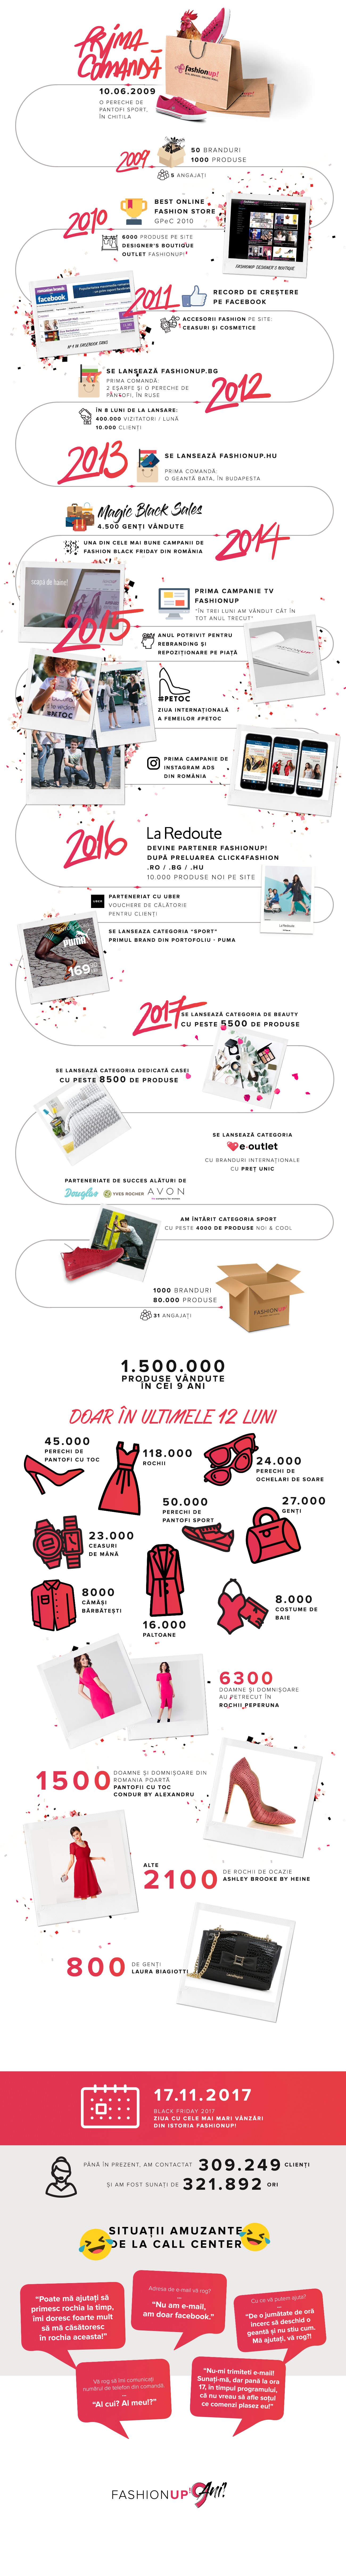 FashionUp 9 ani infografic